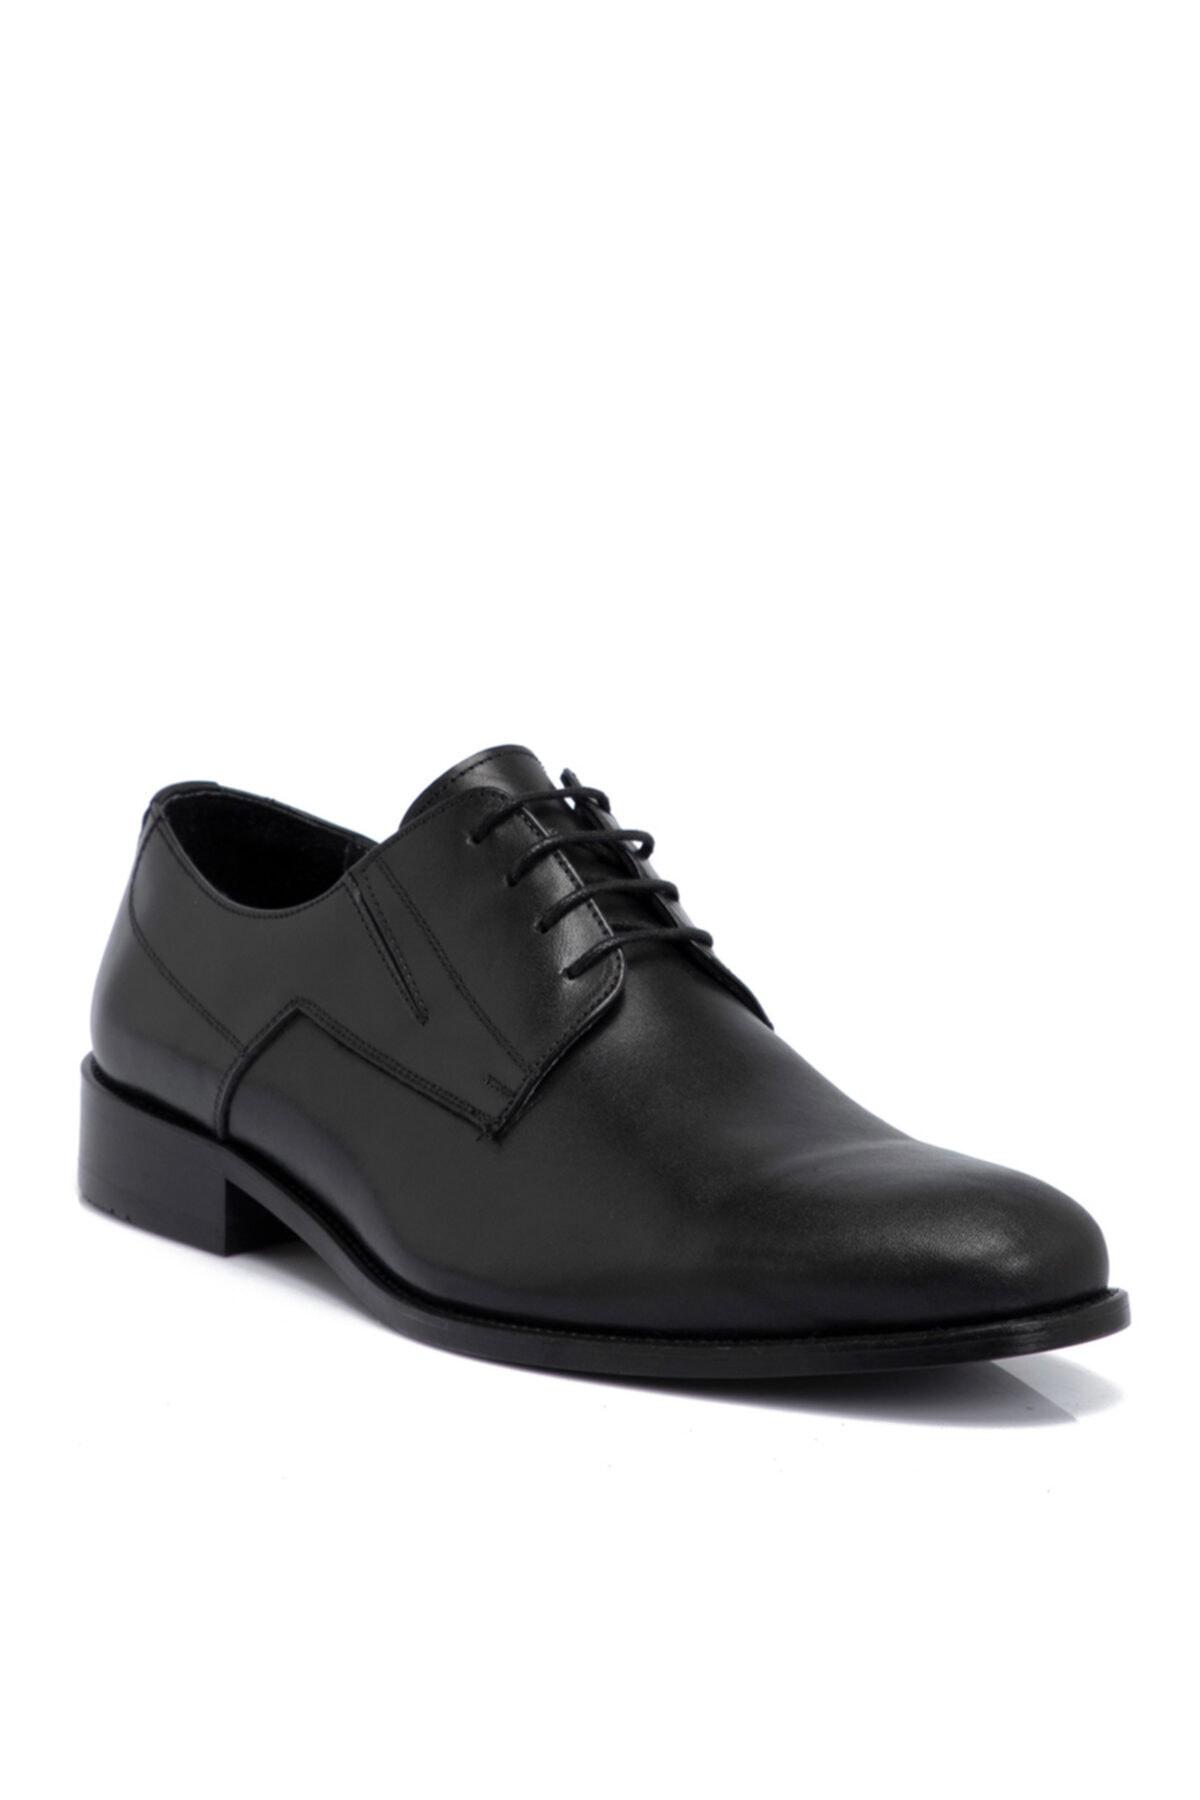 Tergan Siyah Deri Erkek Ayakkabı 54330a43 1